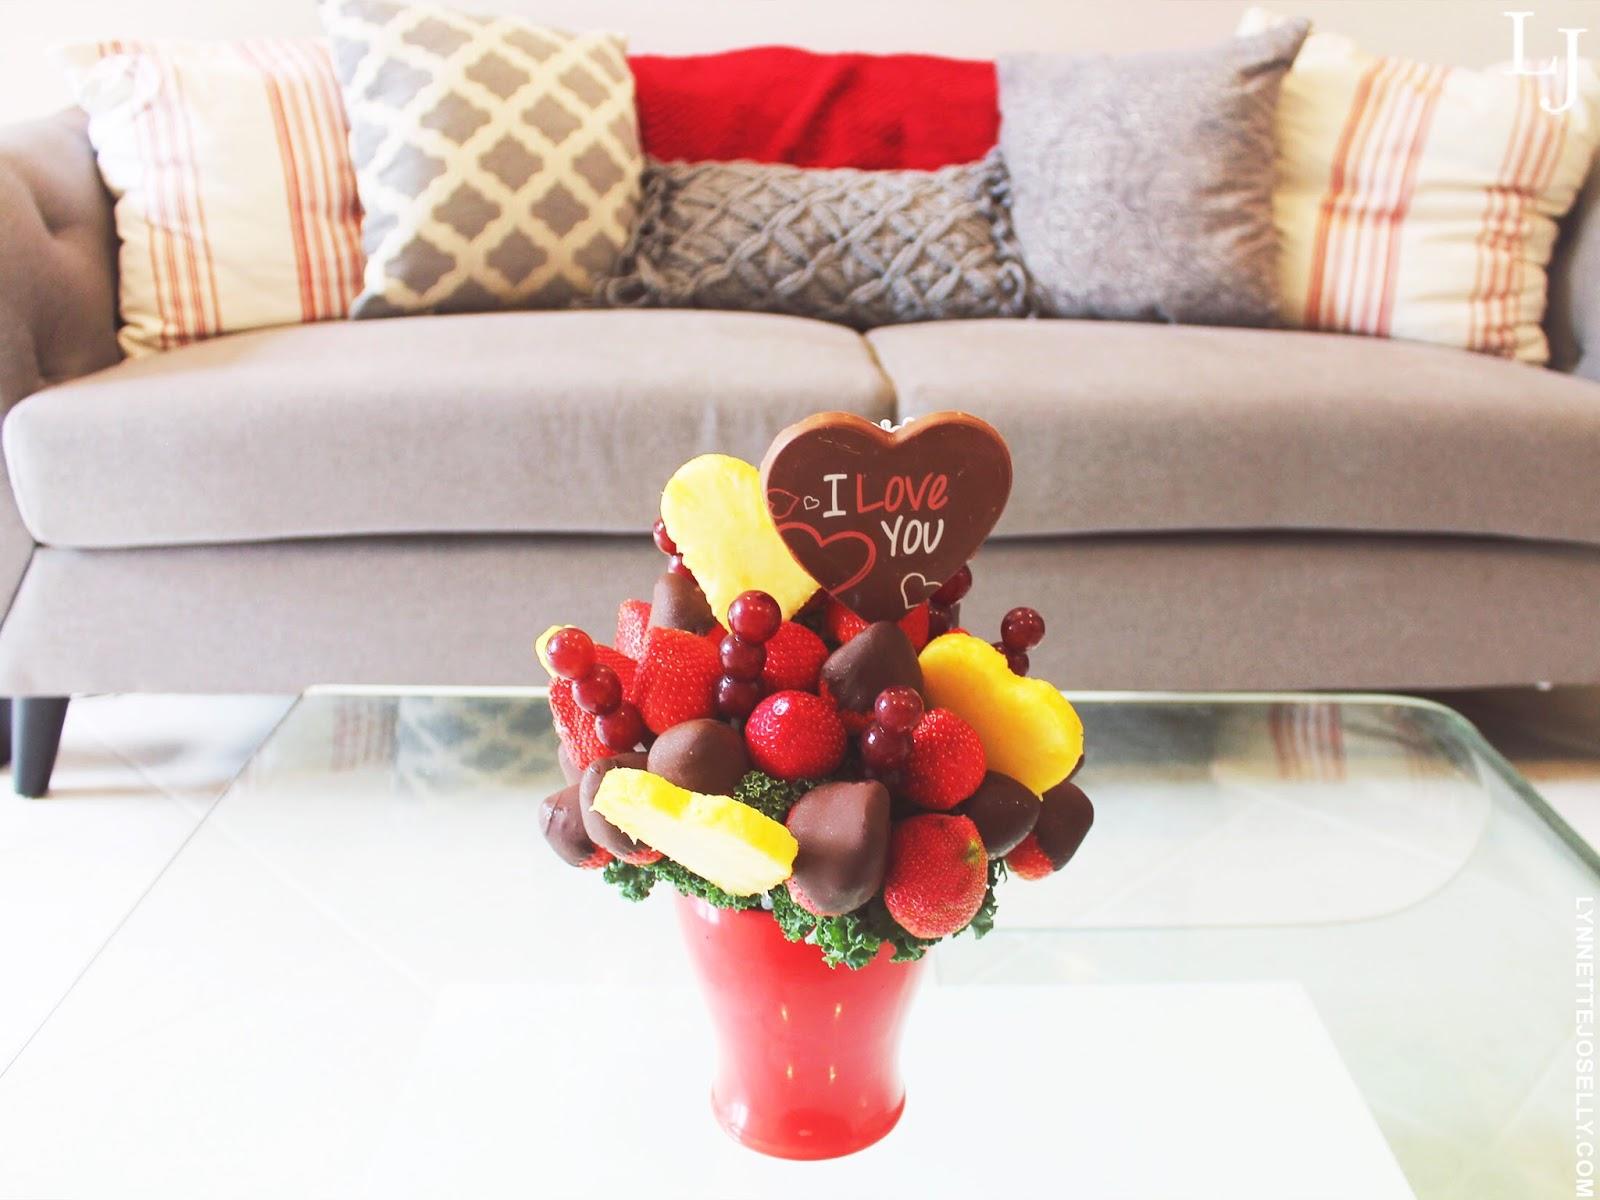 valentines-day-gift-ideas-edible-arrangements